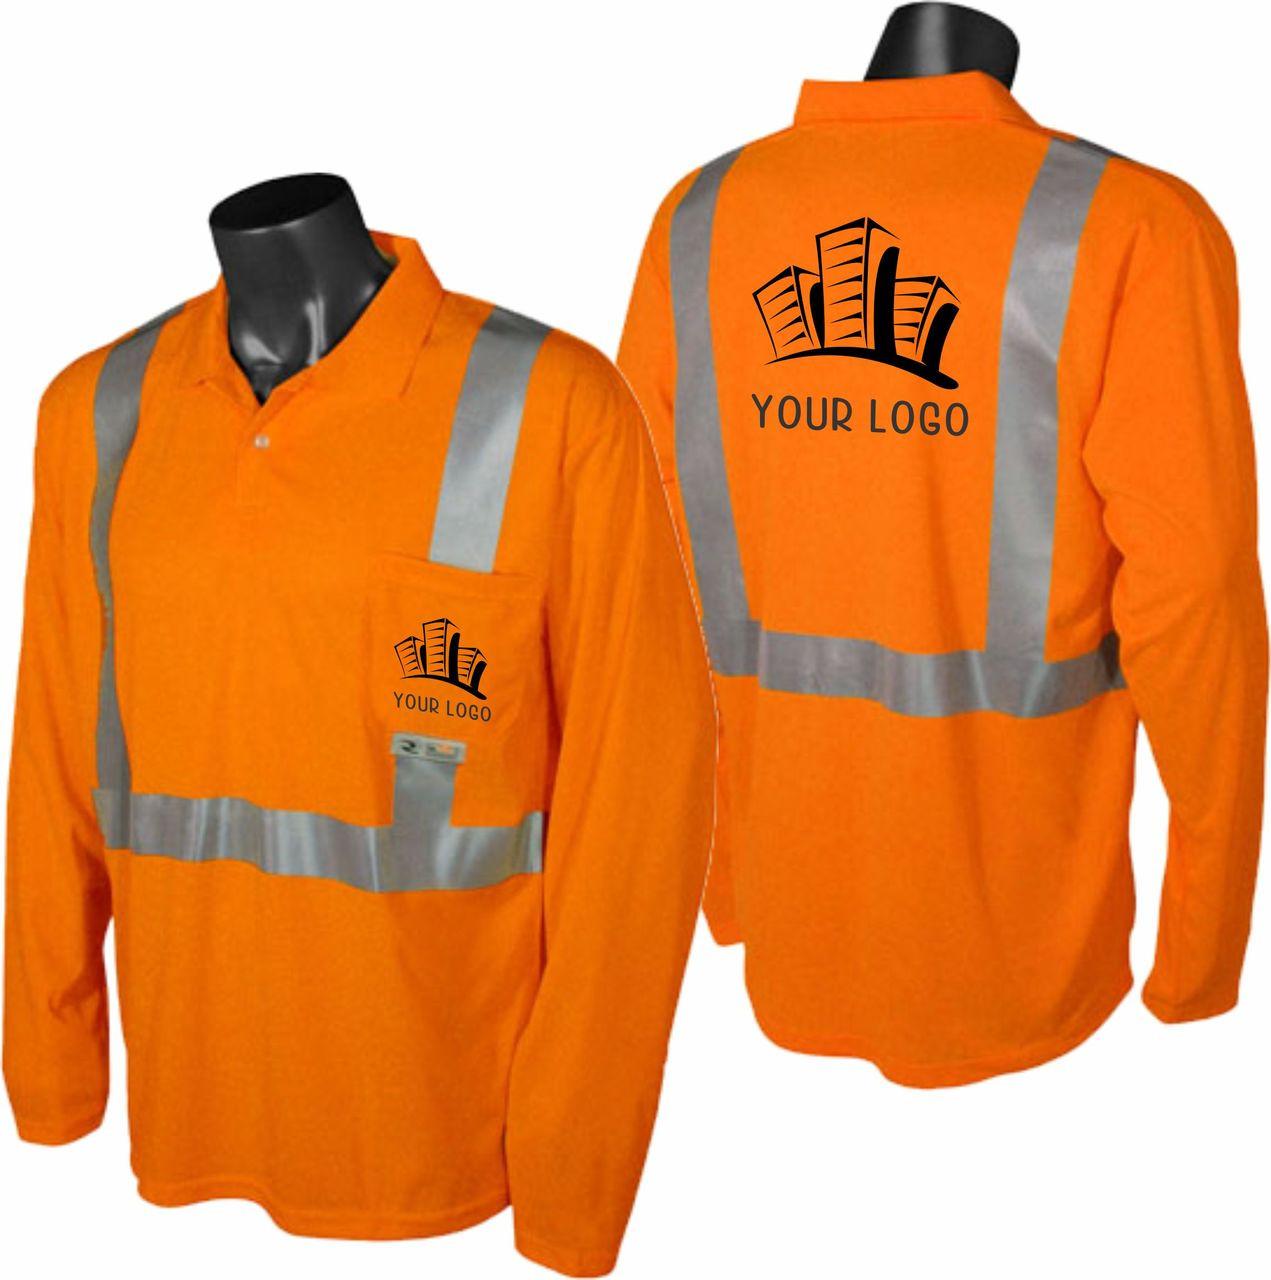 construction polo safety orange with custom imprint